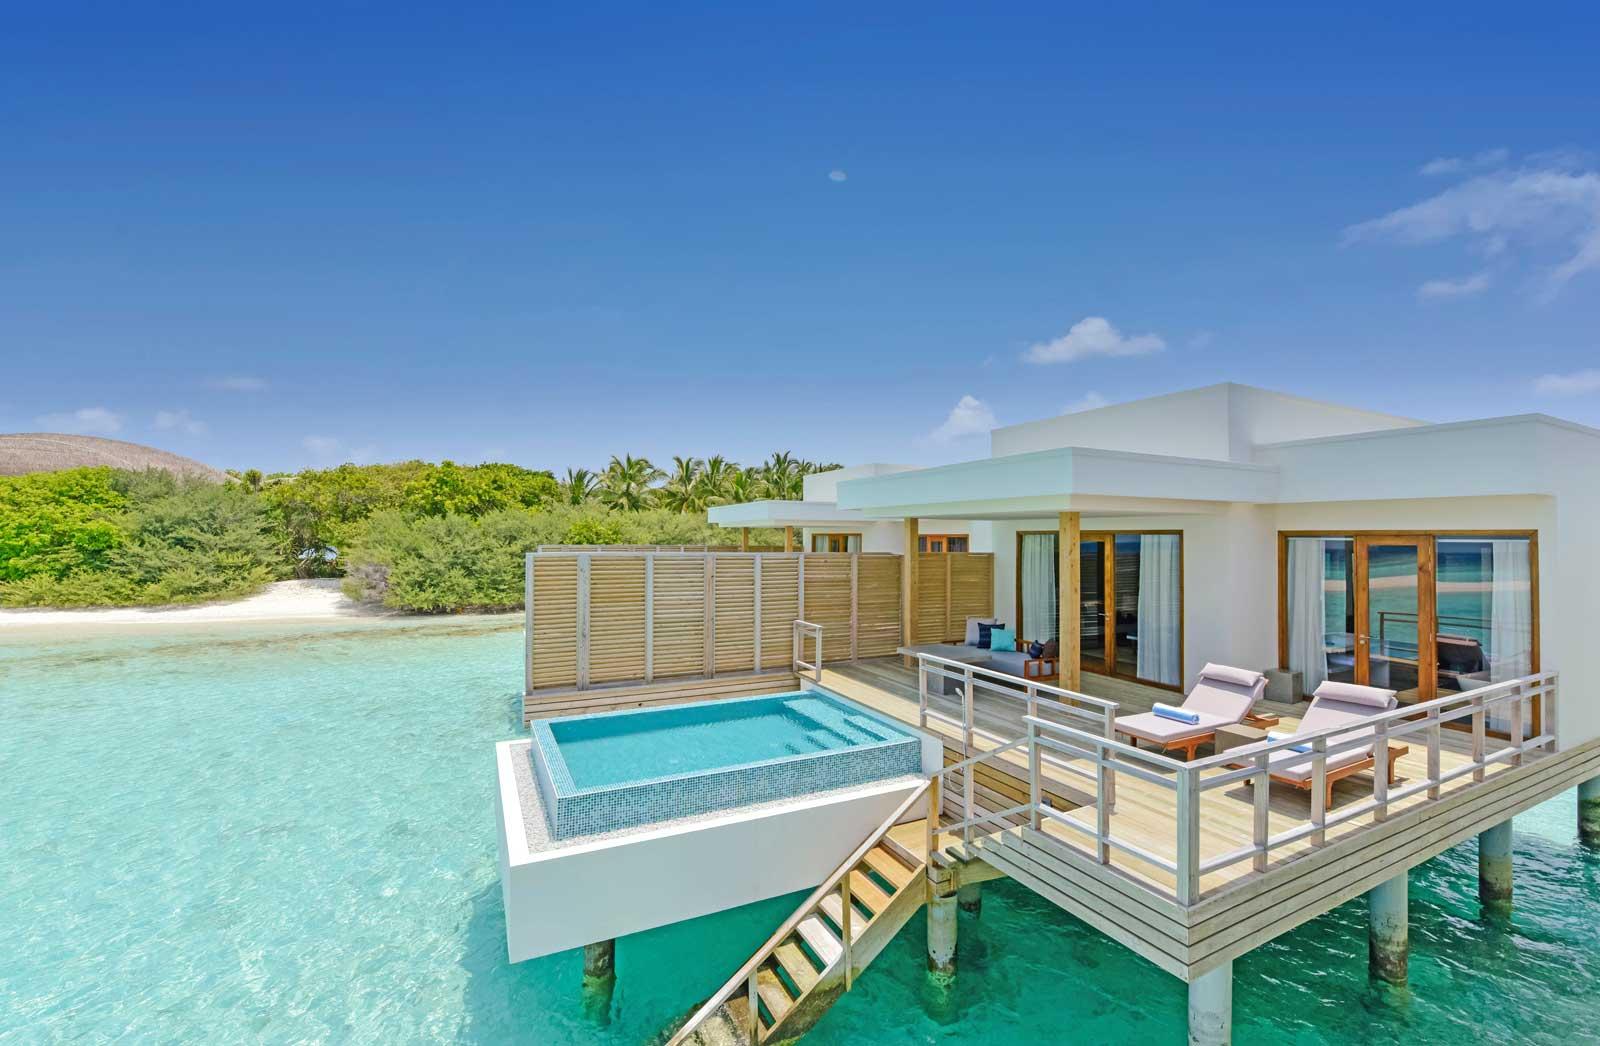 dhigali lagoon villa with pool